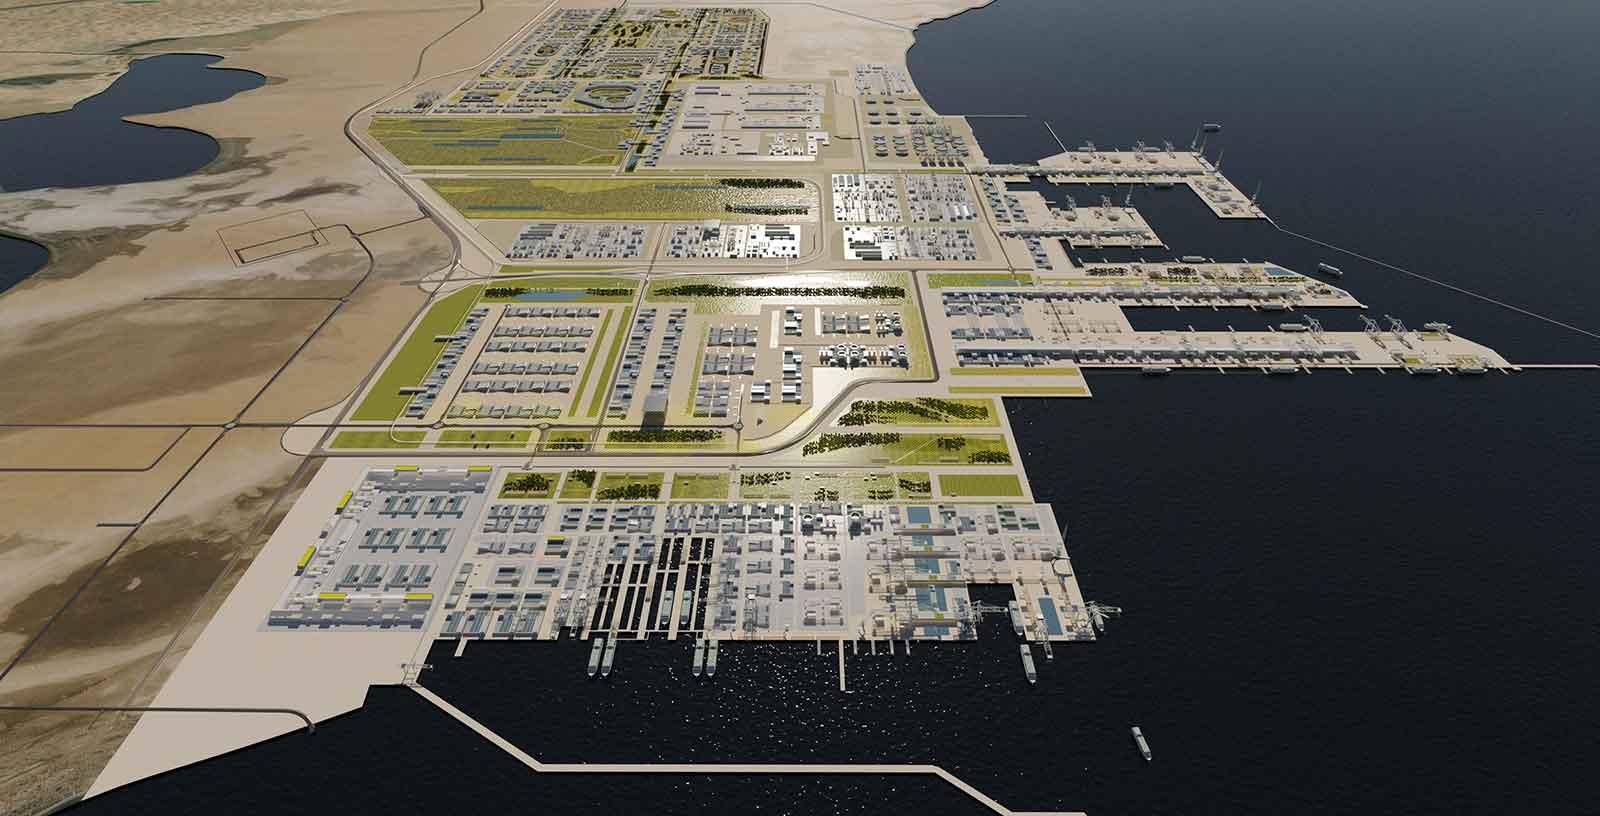 IDOM_Ras Al Khair Industrial City Marketing Study 2